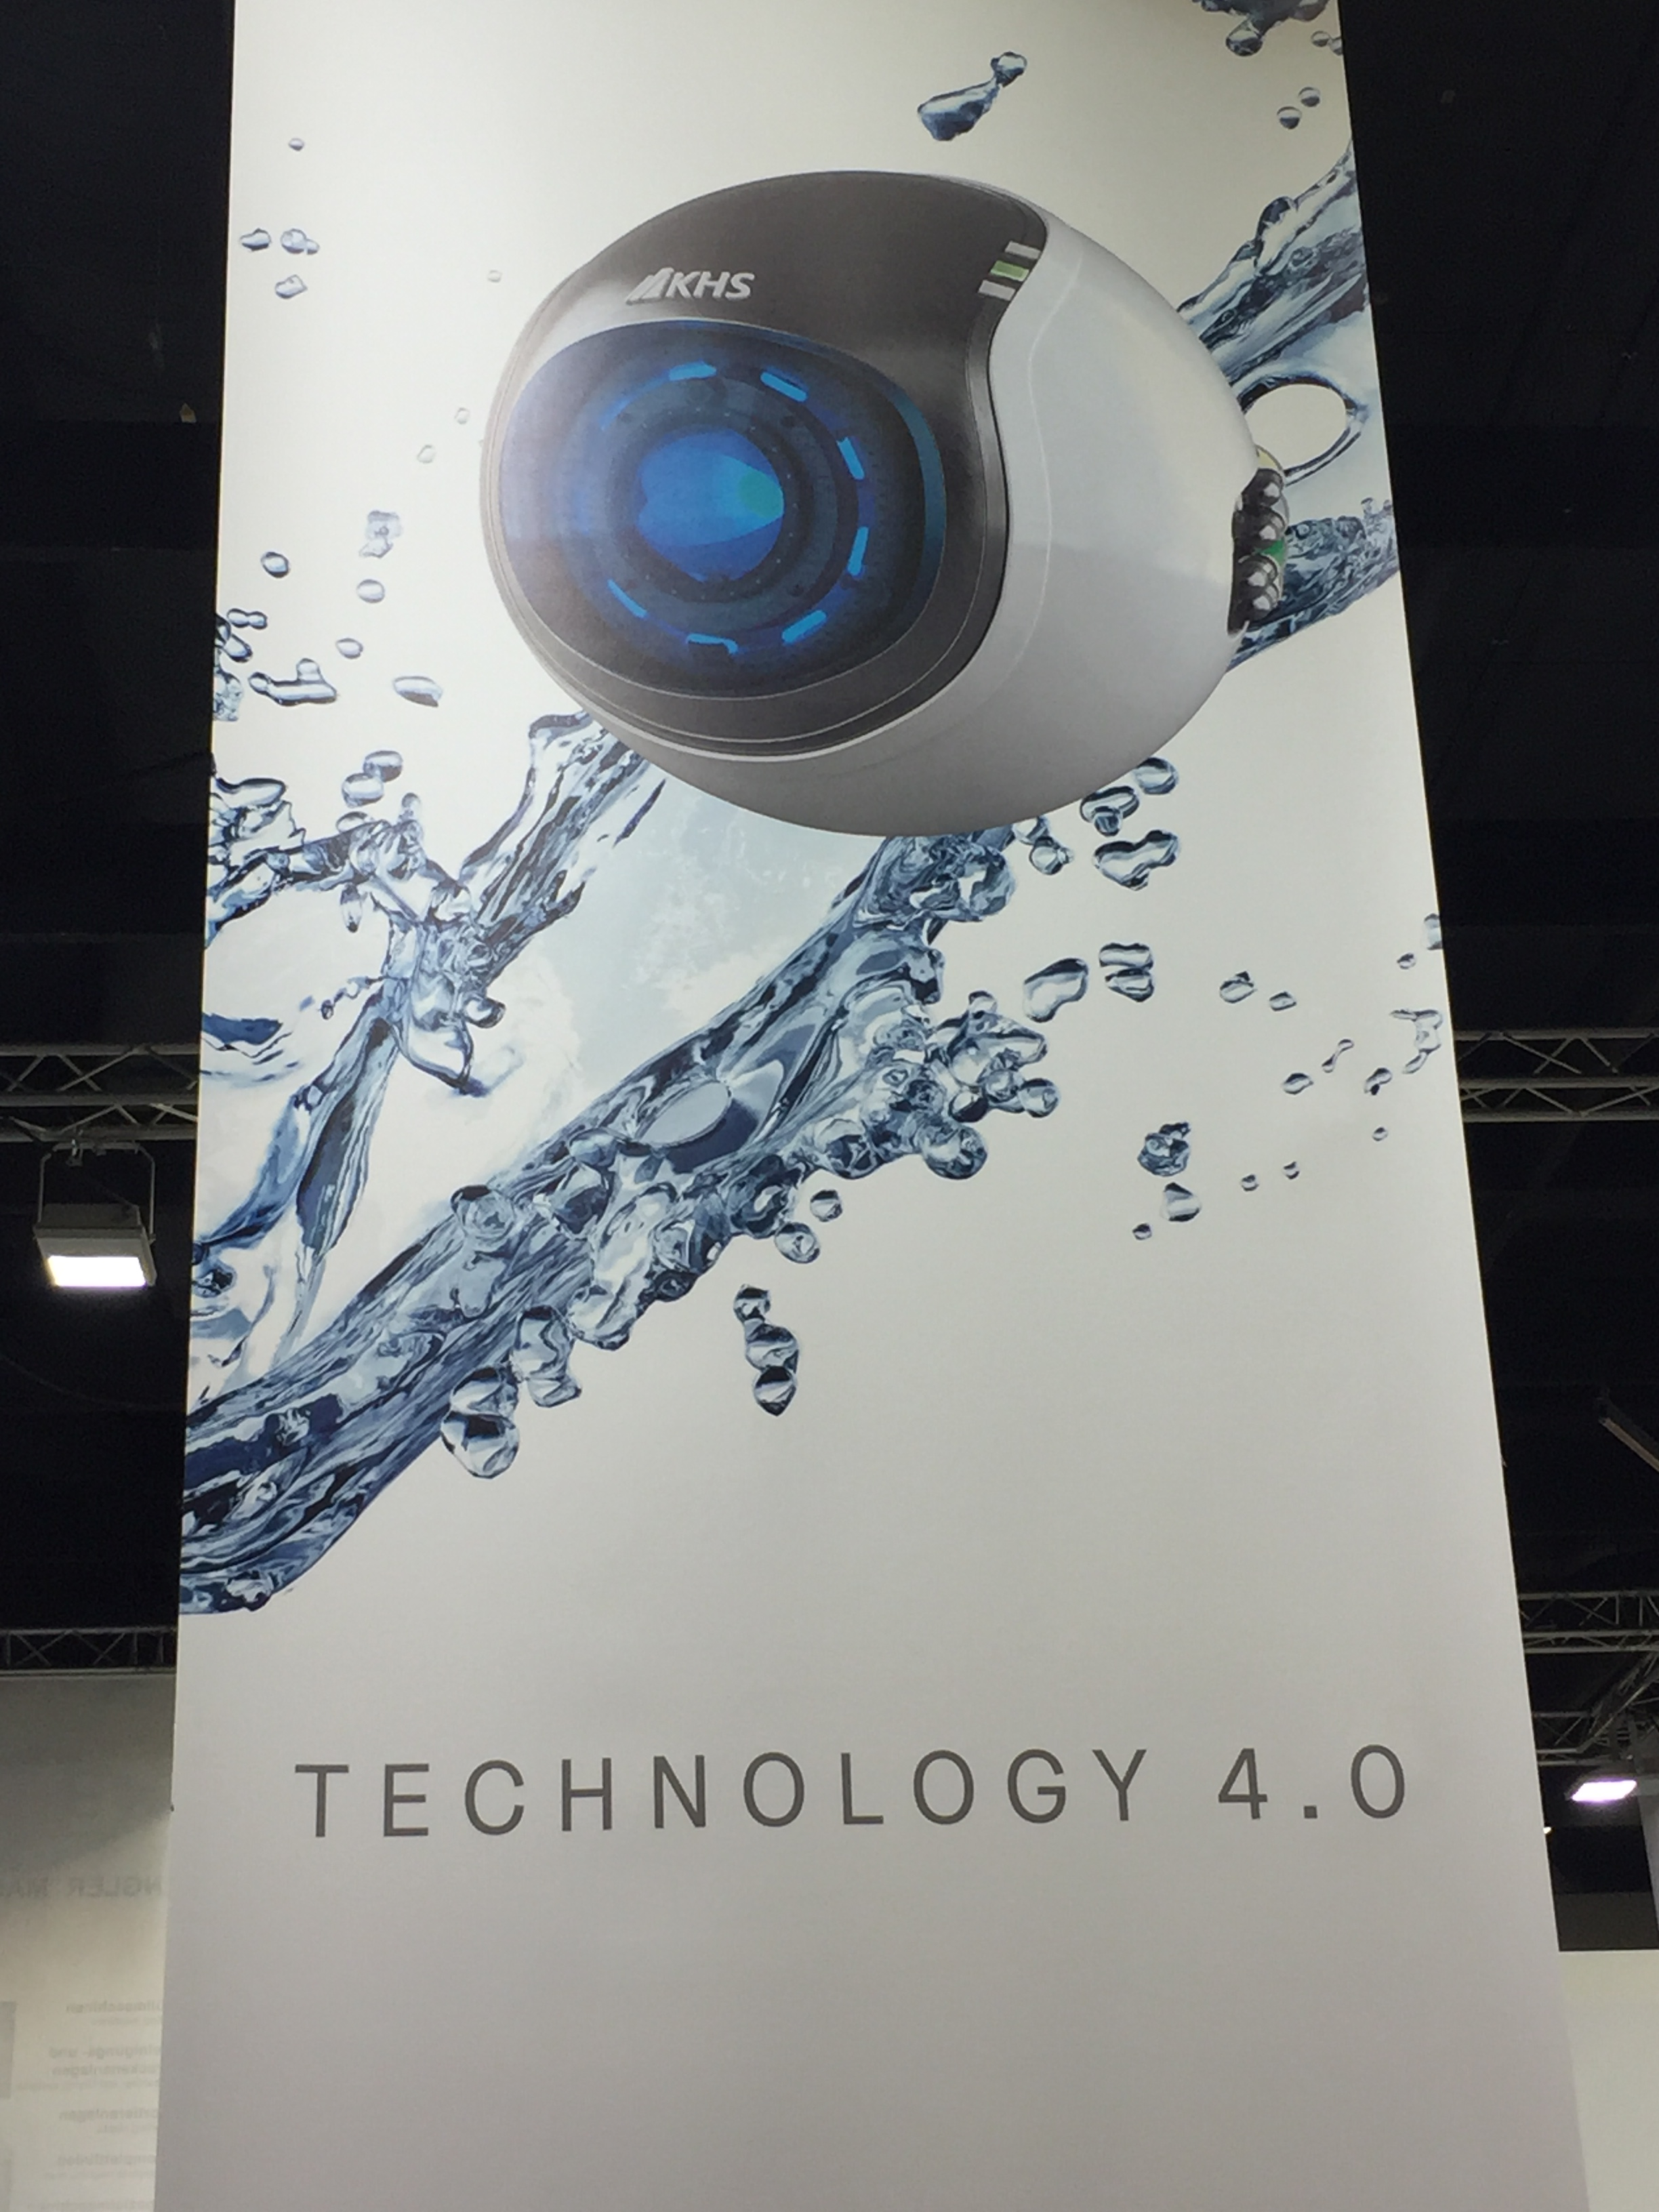 Anuga KHS Technology 40